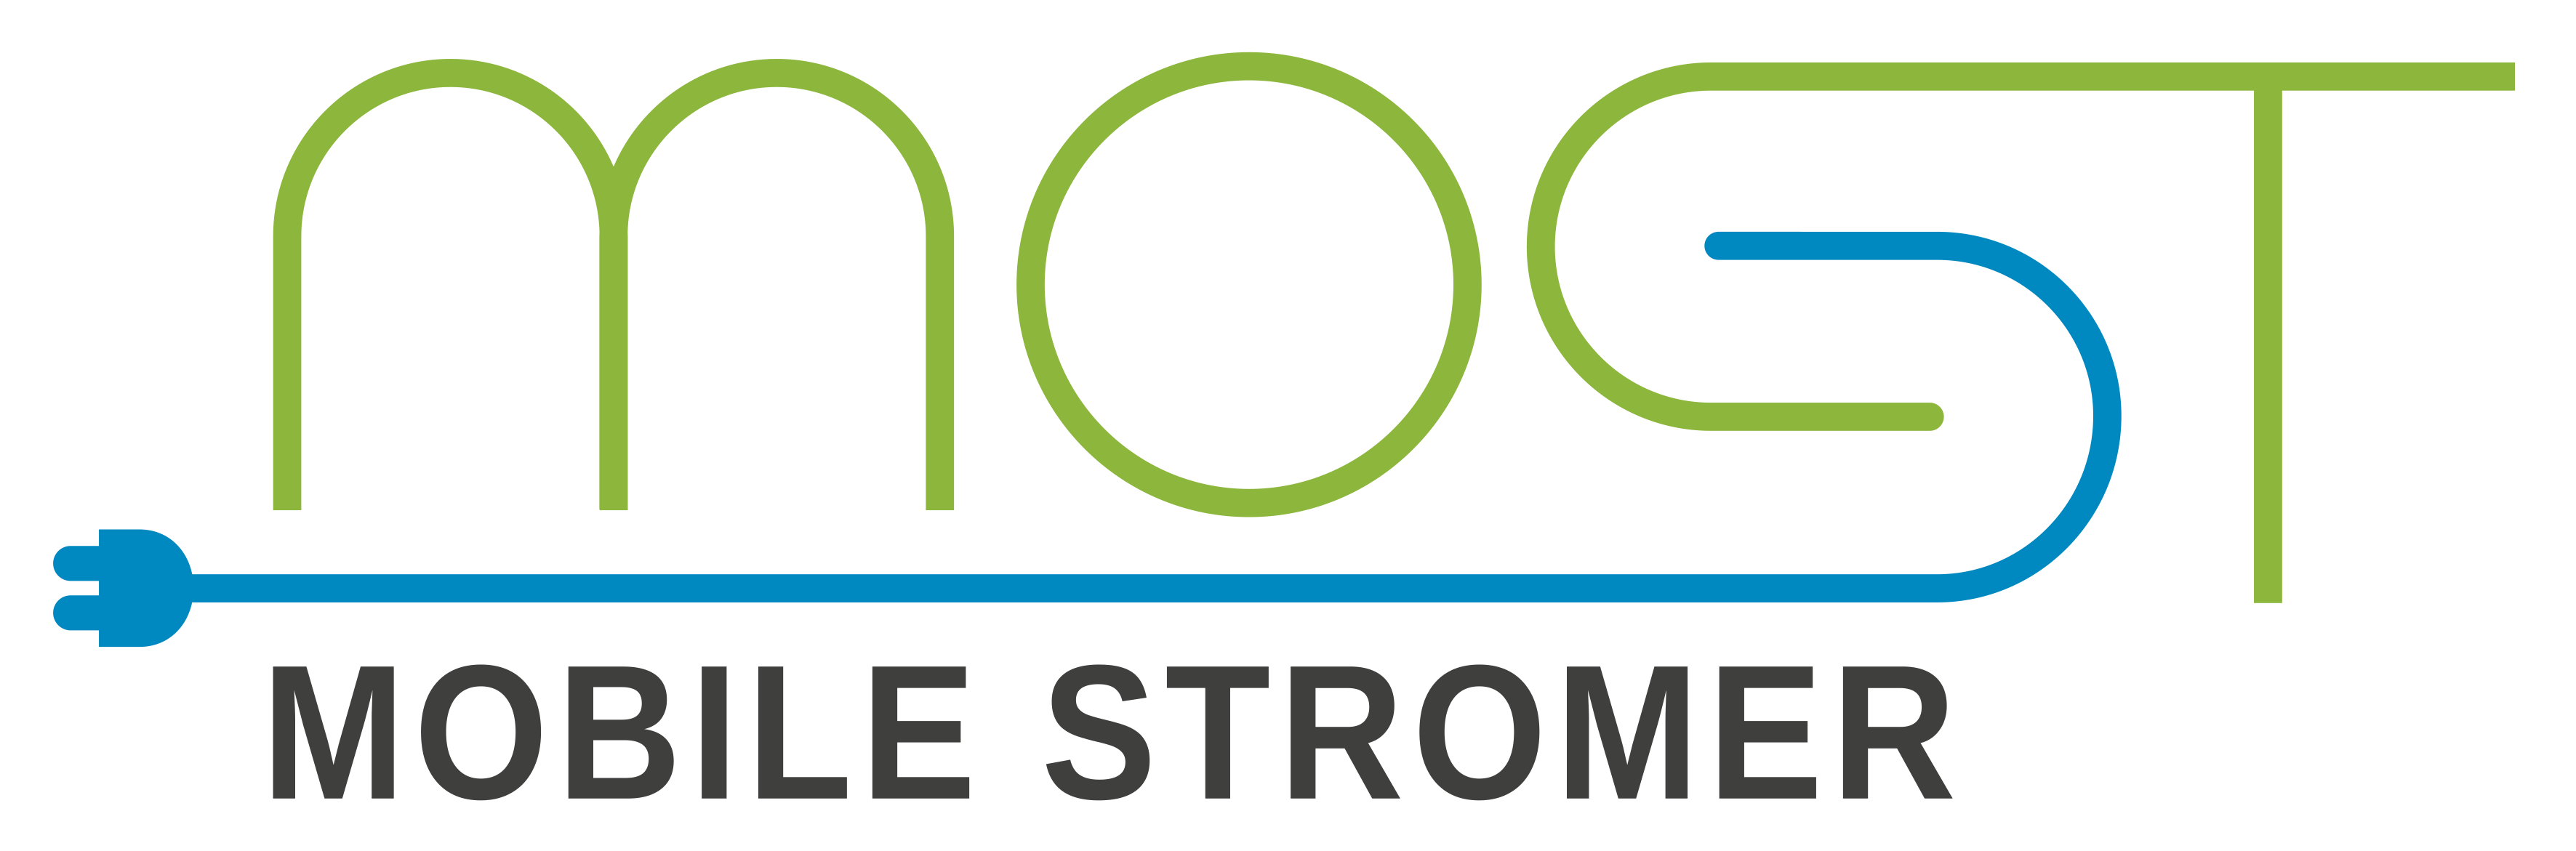 Mobile Stromer